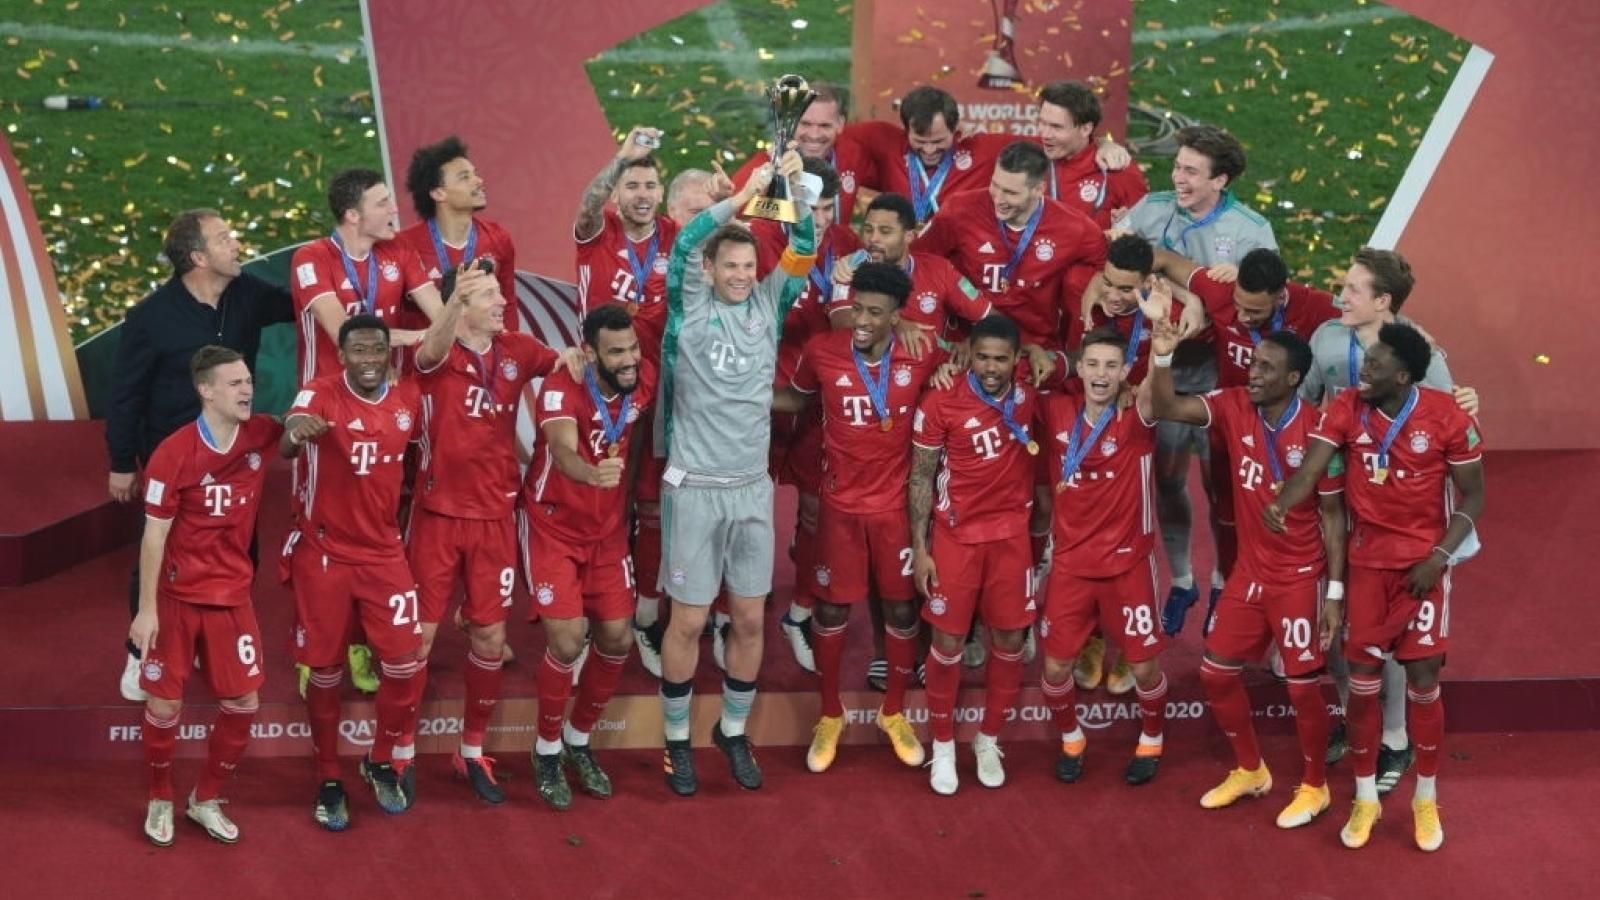 Đánh bại Tigres UANL, Bayern Munich hoàn tất cú ăn 6